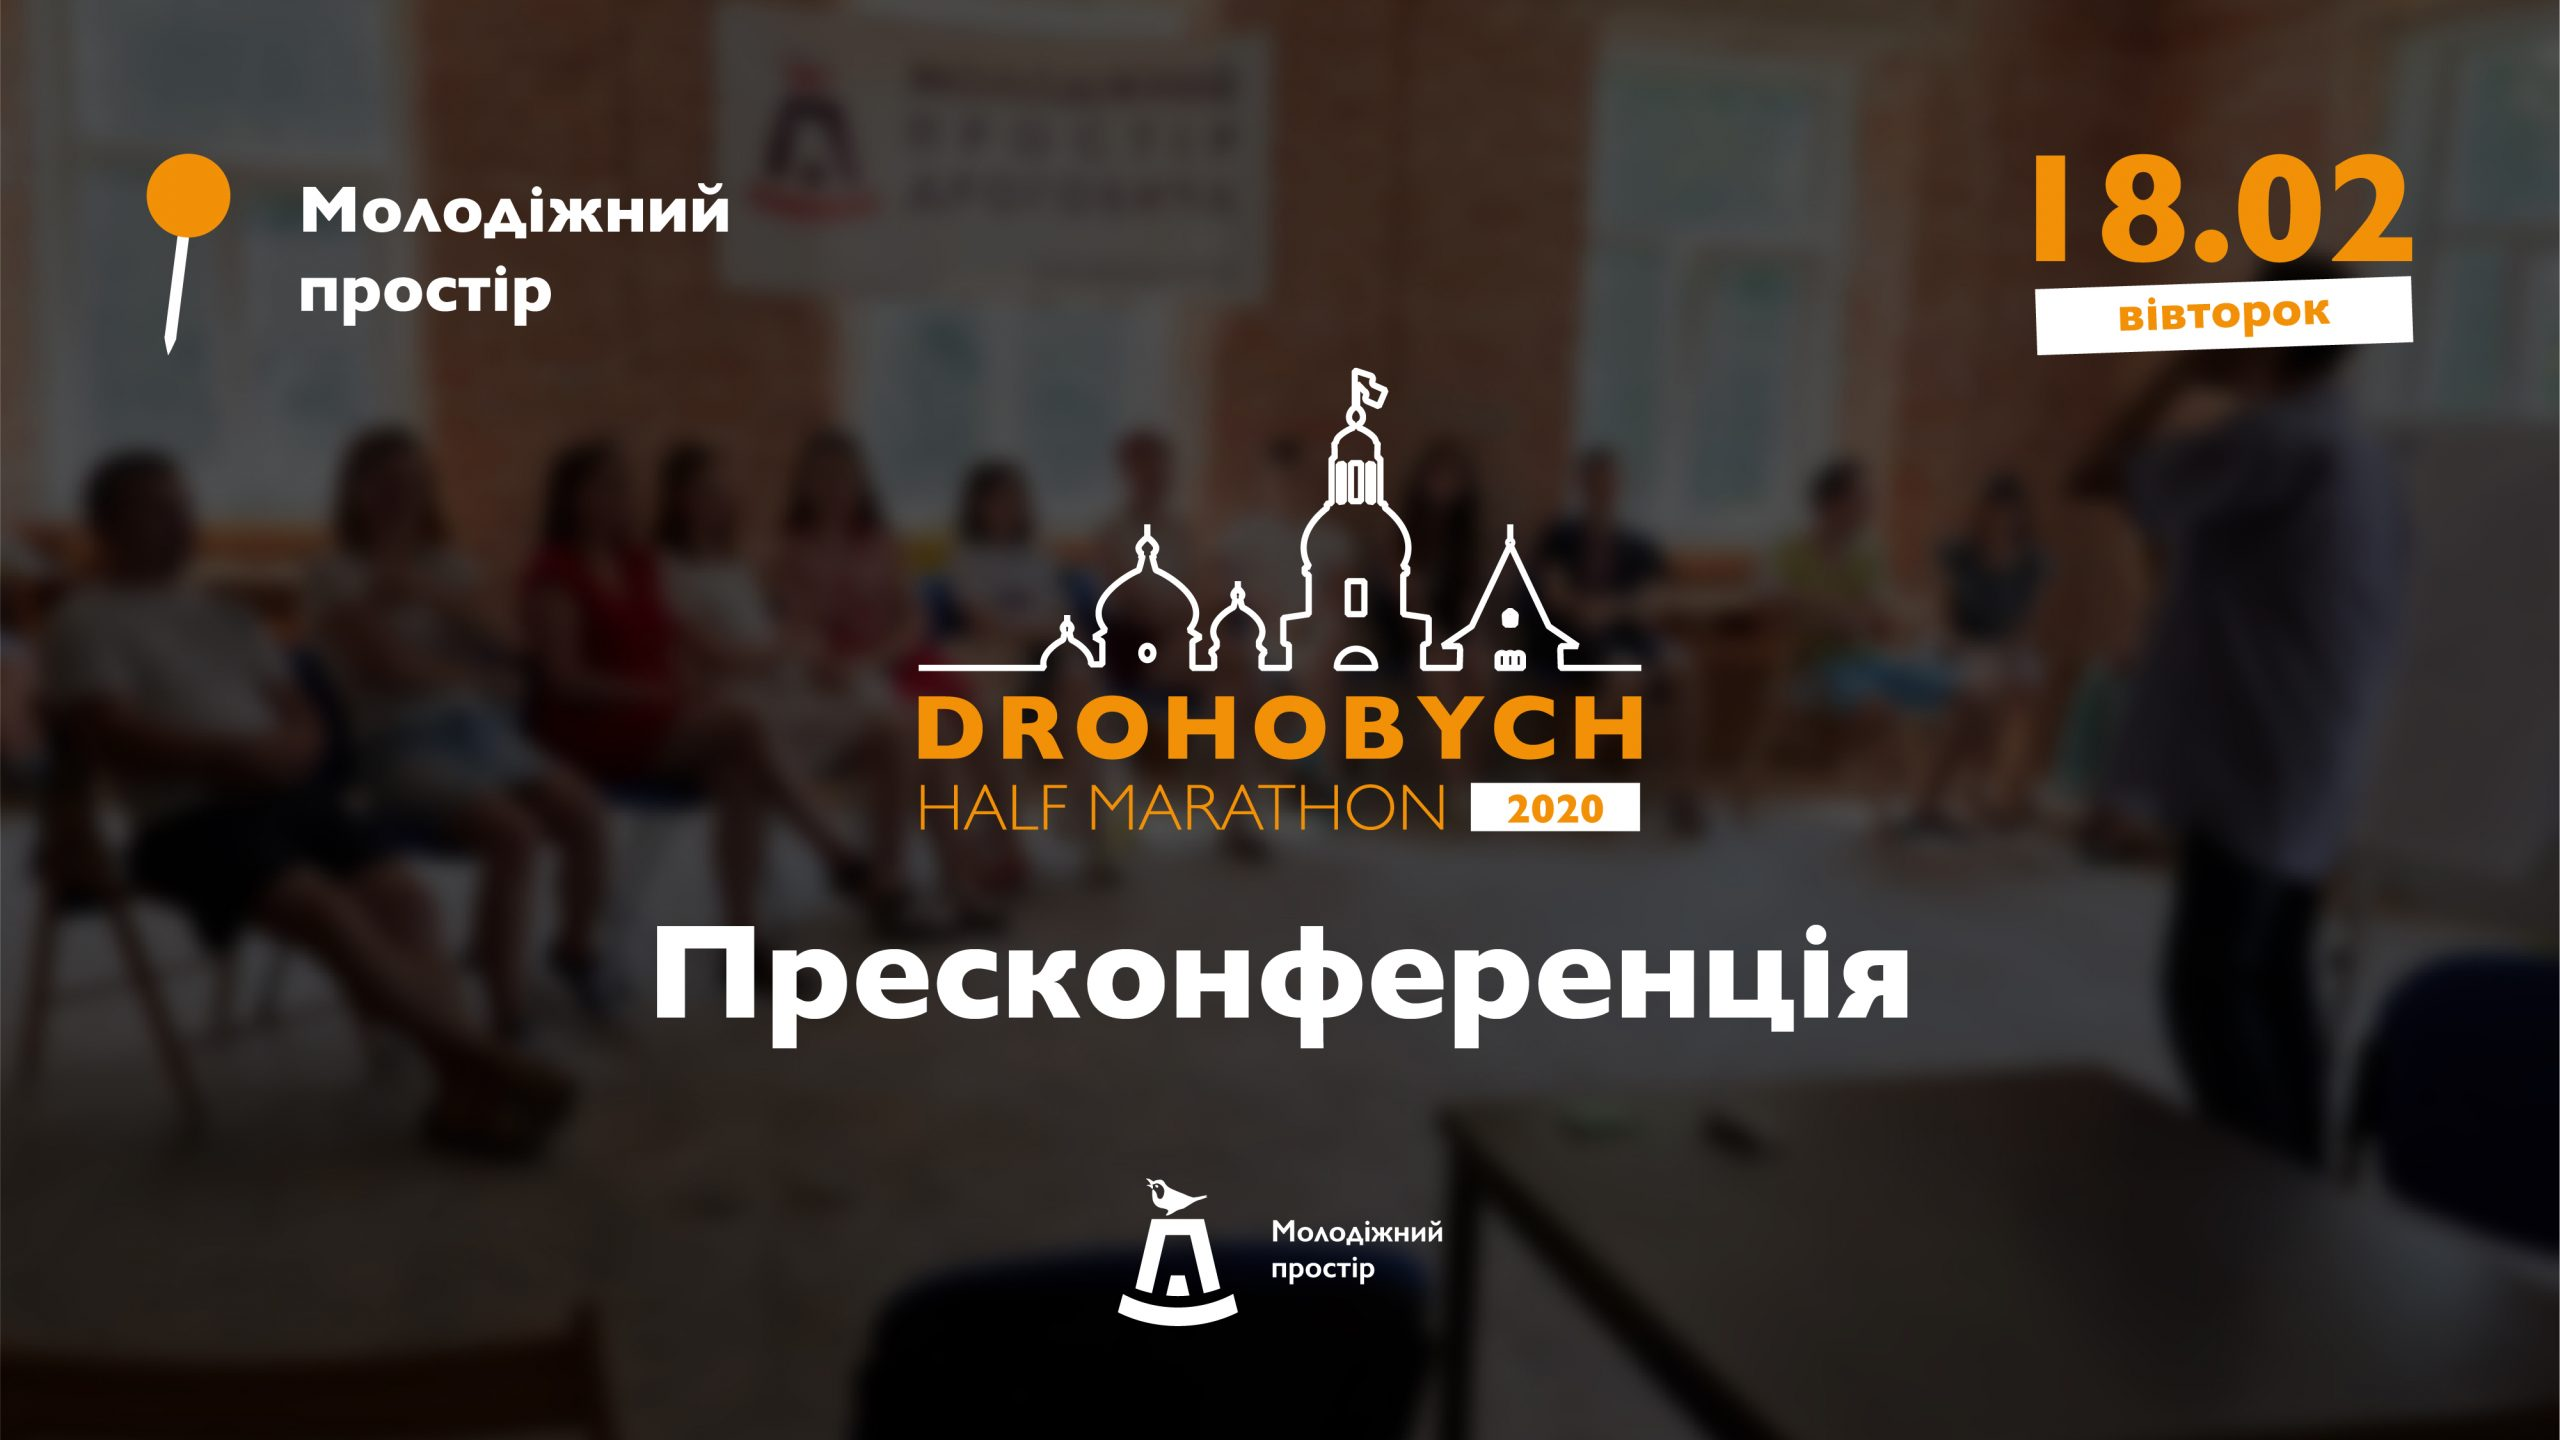 2020-02-13-Drohobych-Hal-Marathon-event-01-scaled.jpg